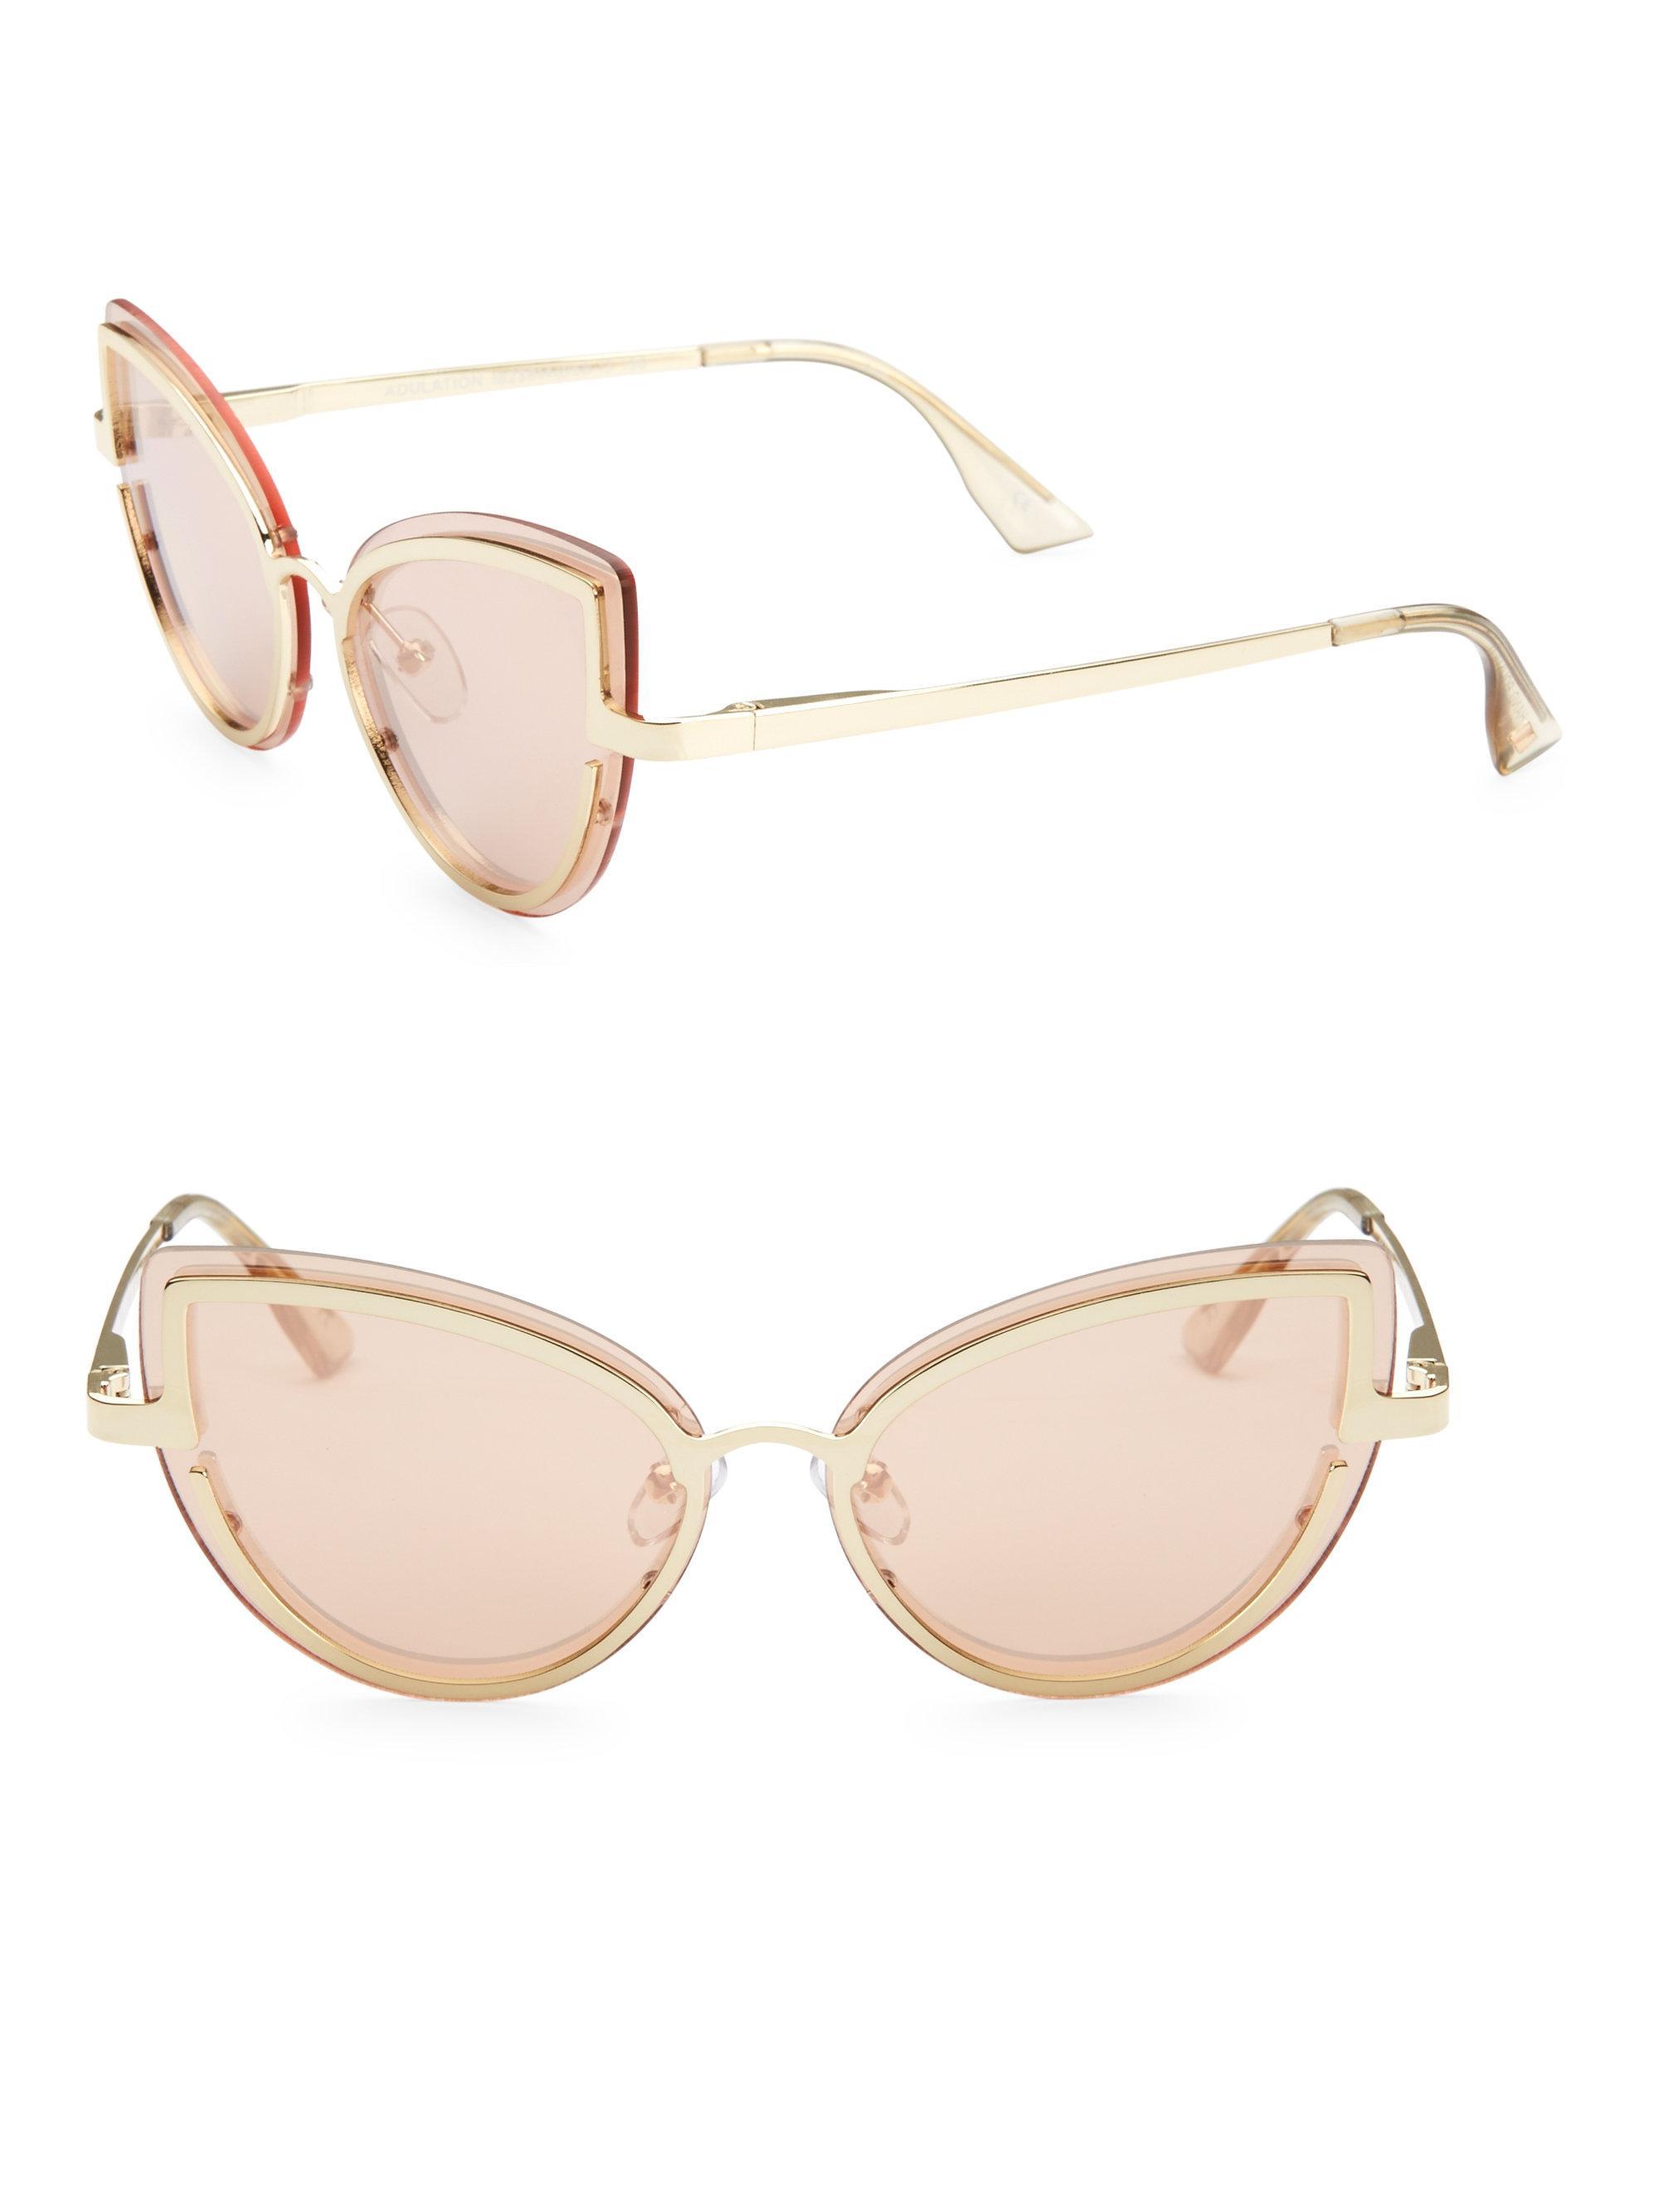 30e79236ca Le Specs Adulation Gold Cat Eye Sungles In Metallic Lyst